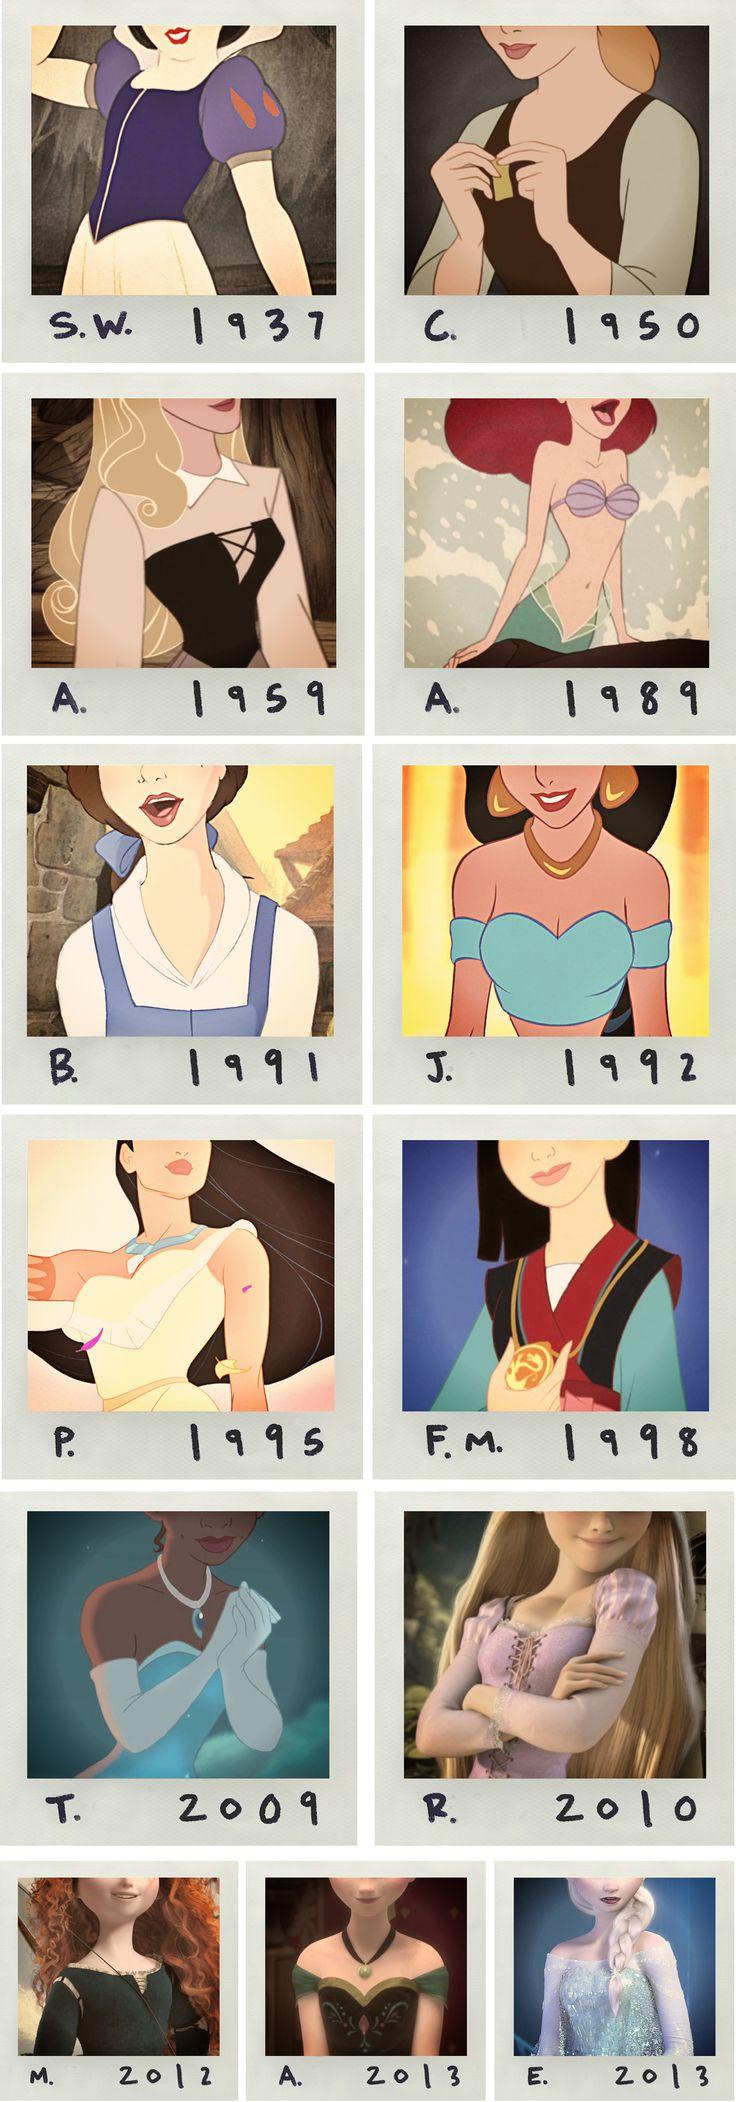 Disney Princesses - 1989 style